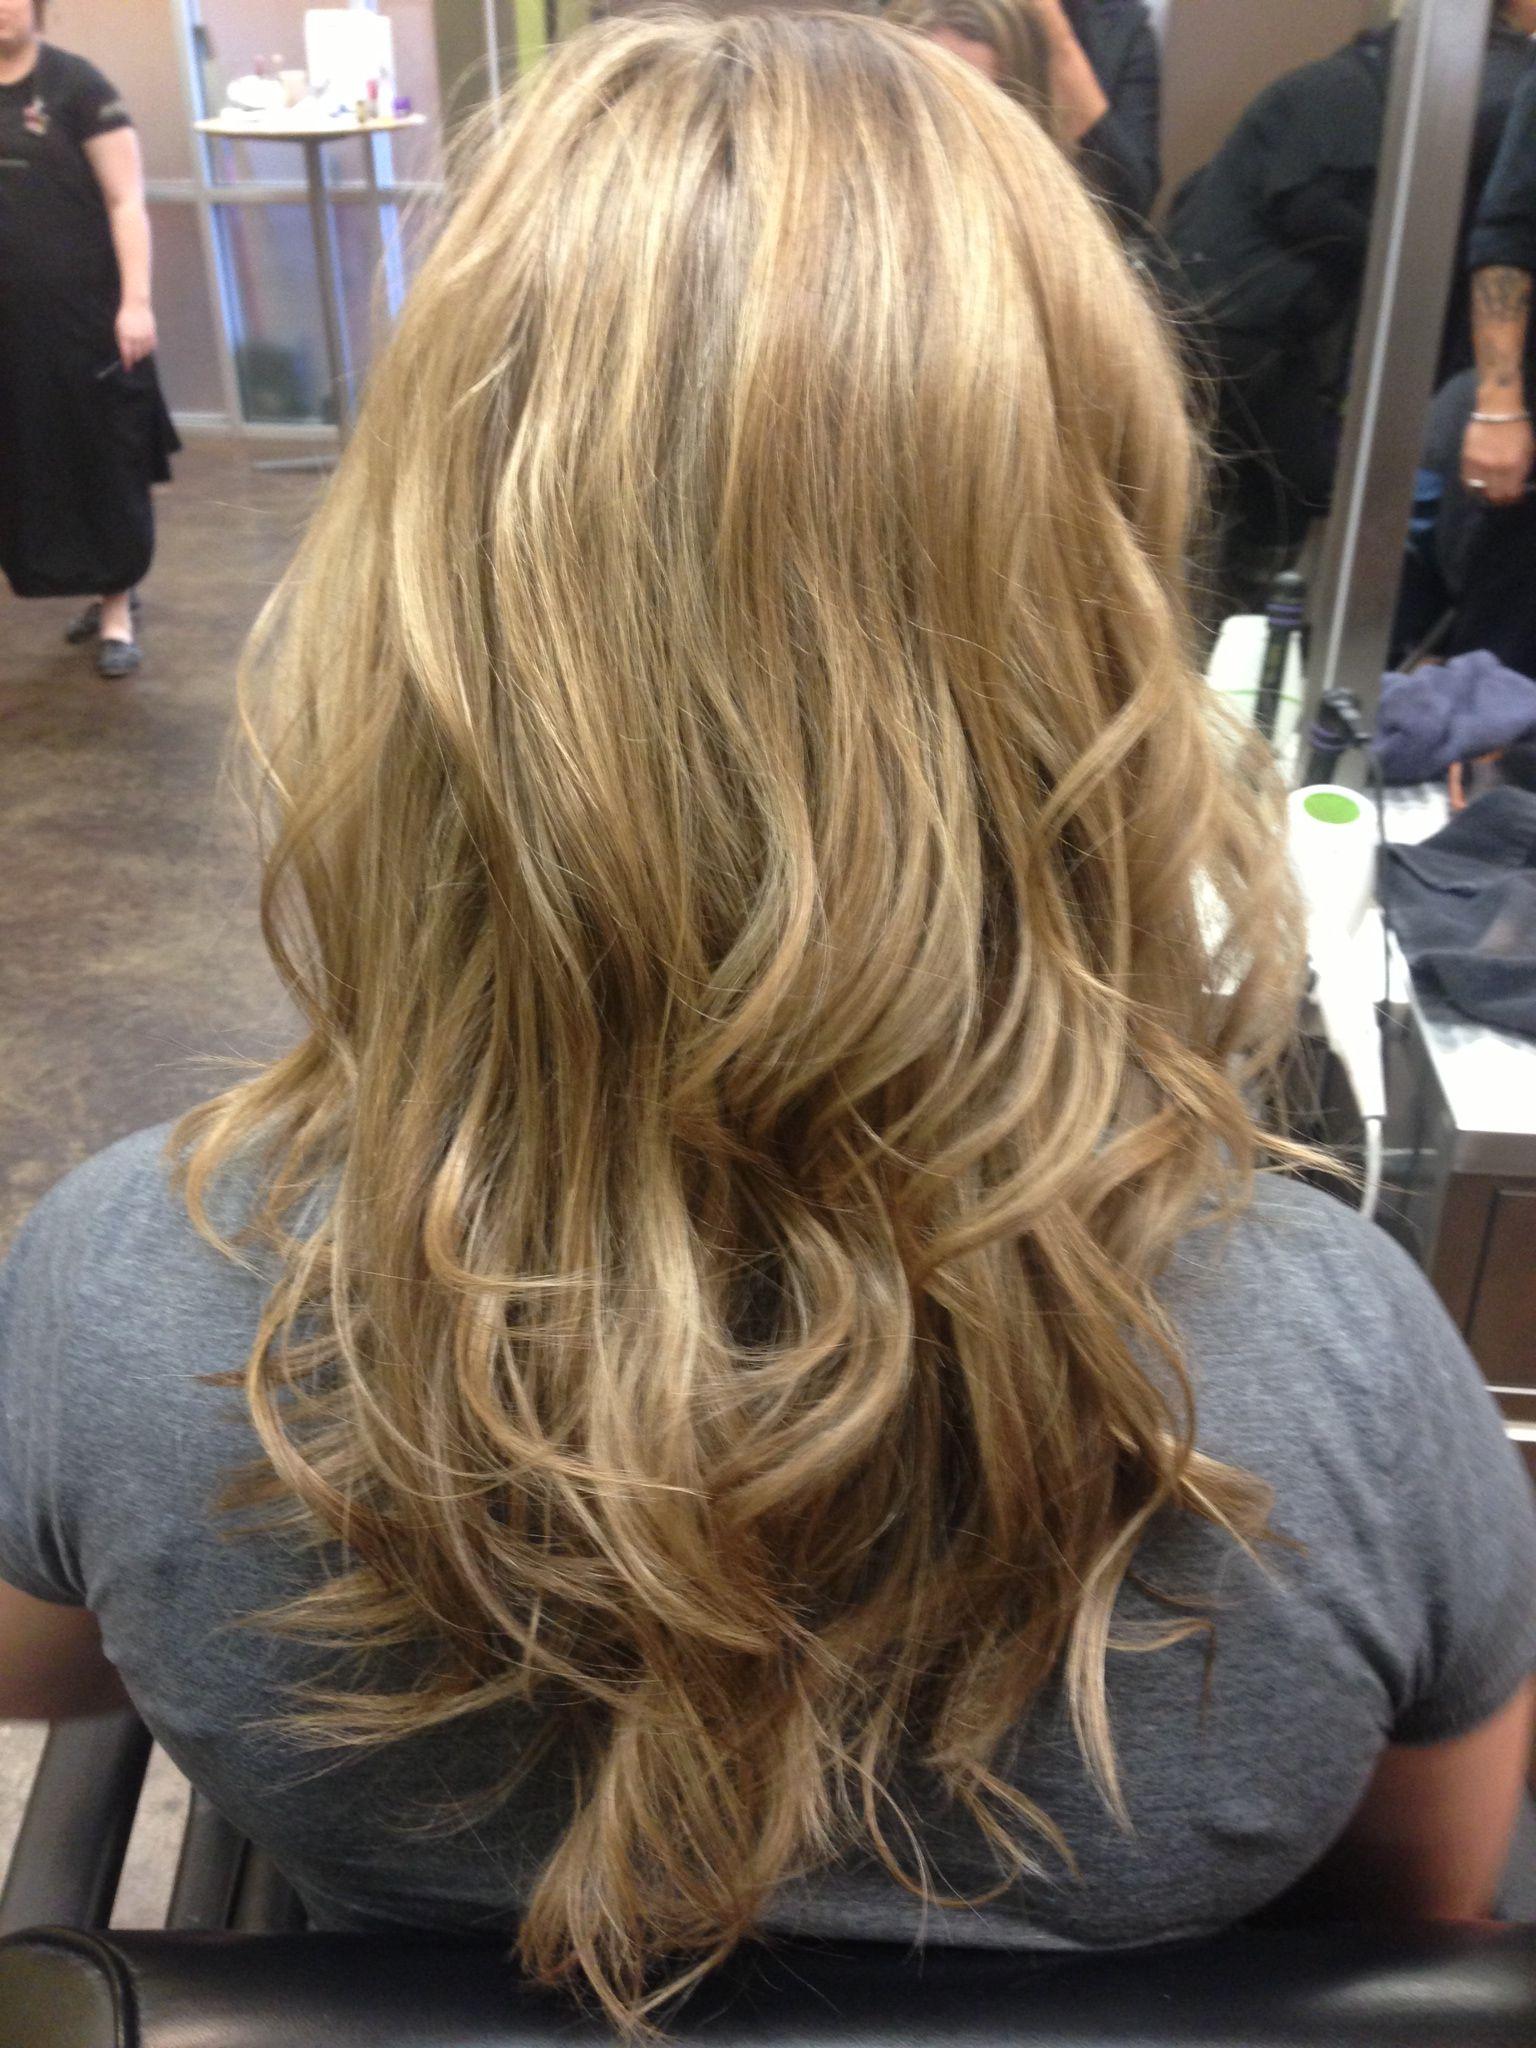 Highlights On Dirty Blonde Lovely Locks Hair Styles